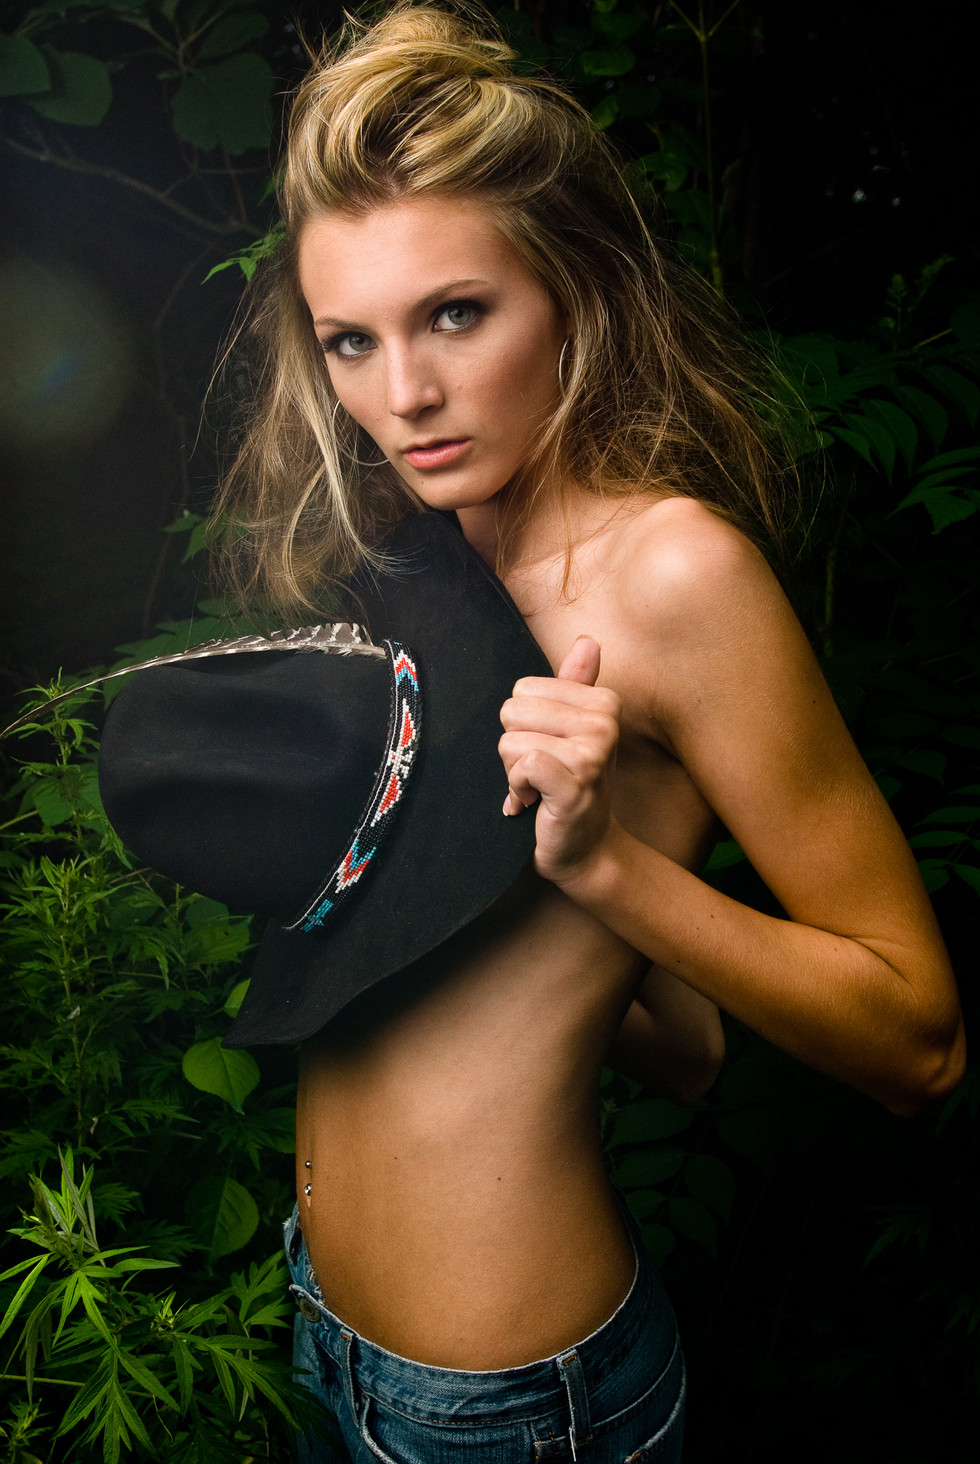 Alexandra Cheshul - Horse Stable 06-30-0